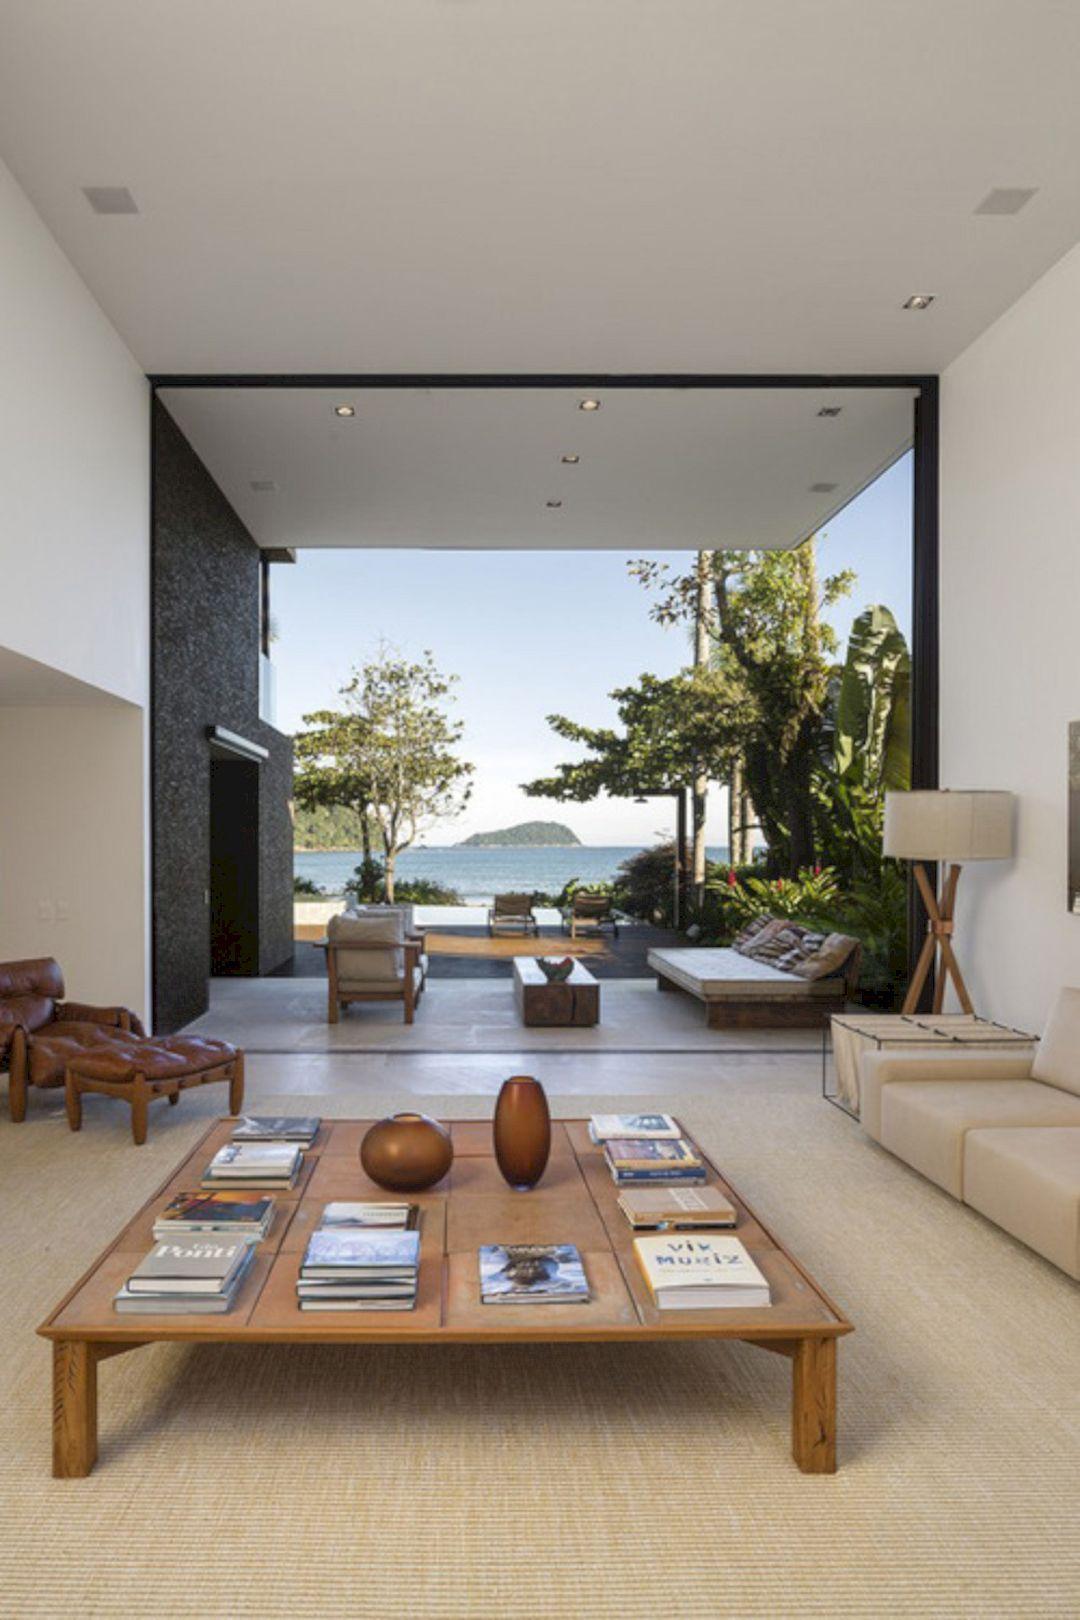 86 amazing modern beach house designs https www futuristarchitecture com